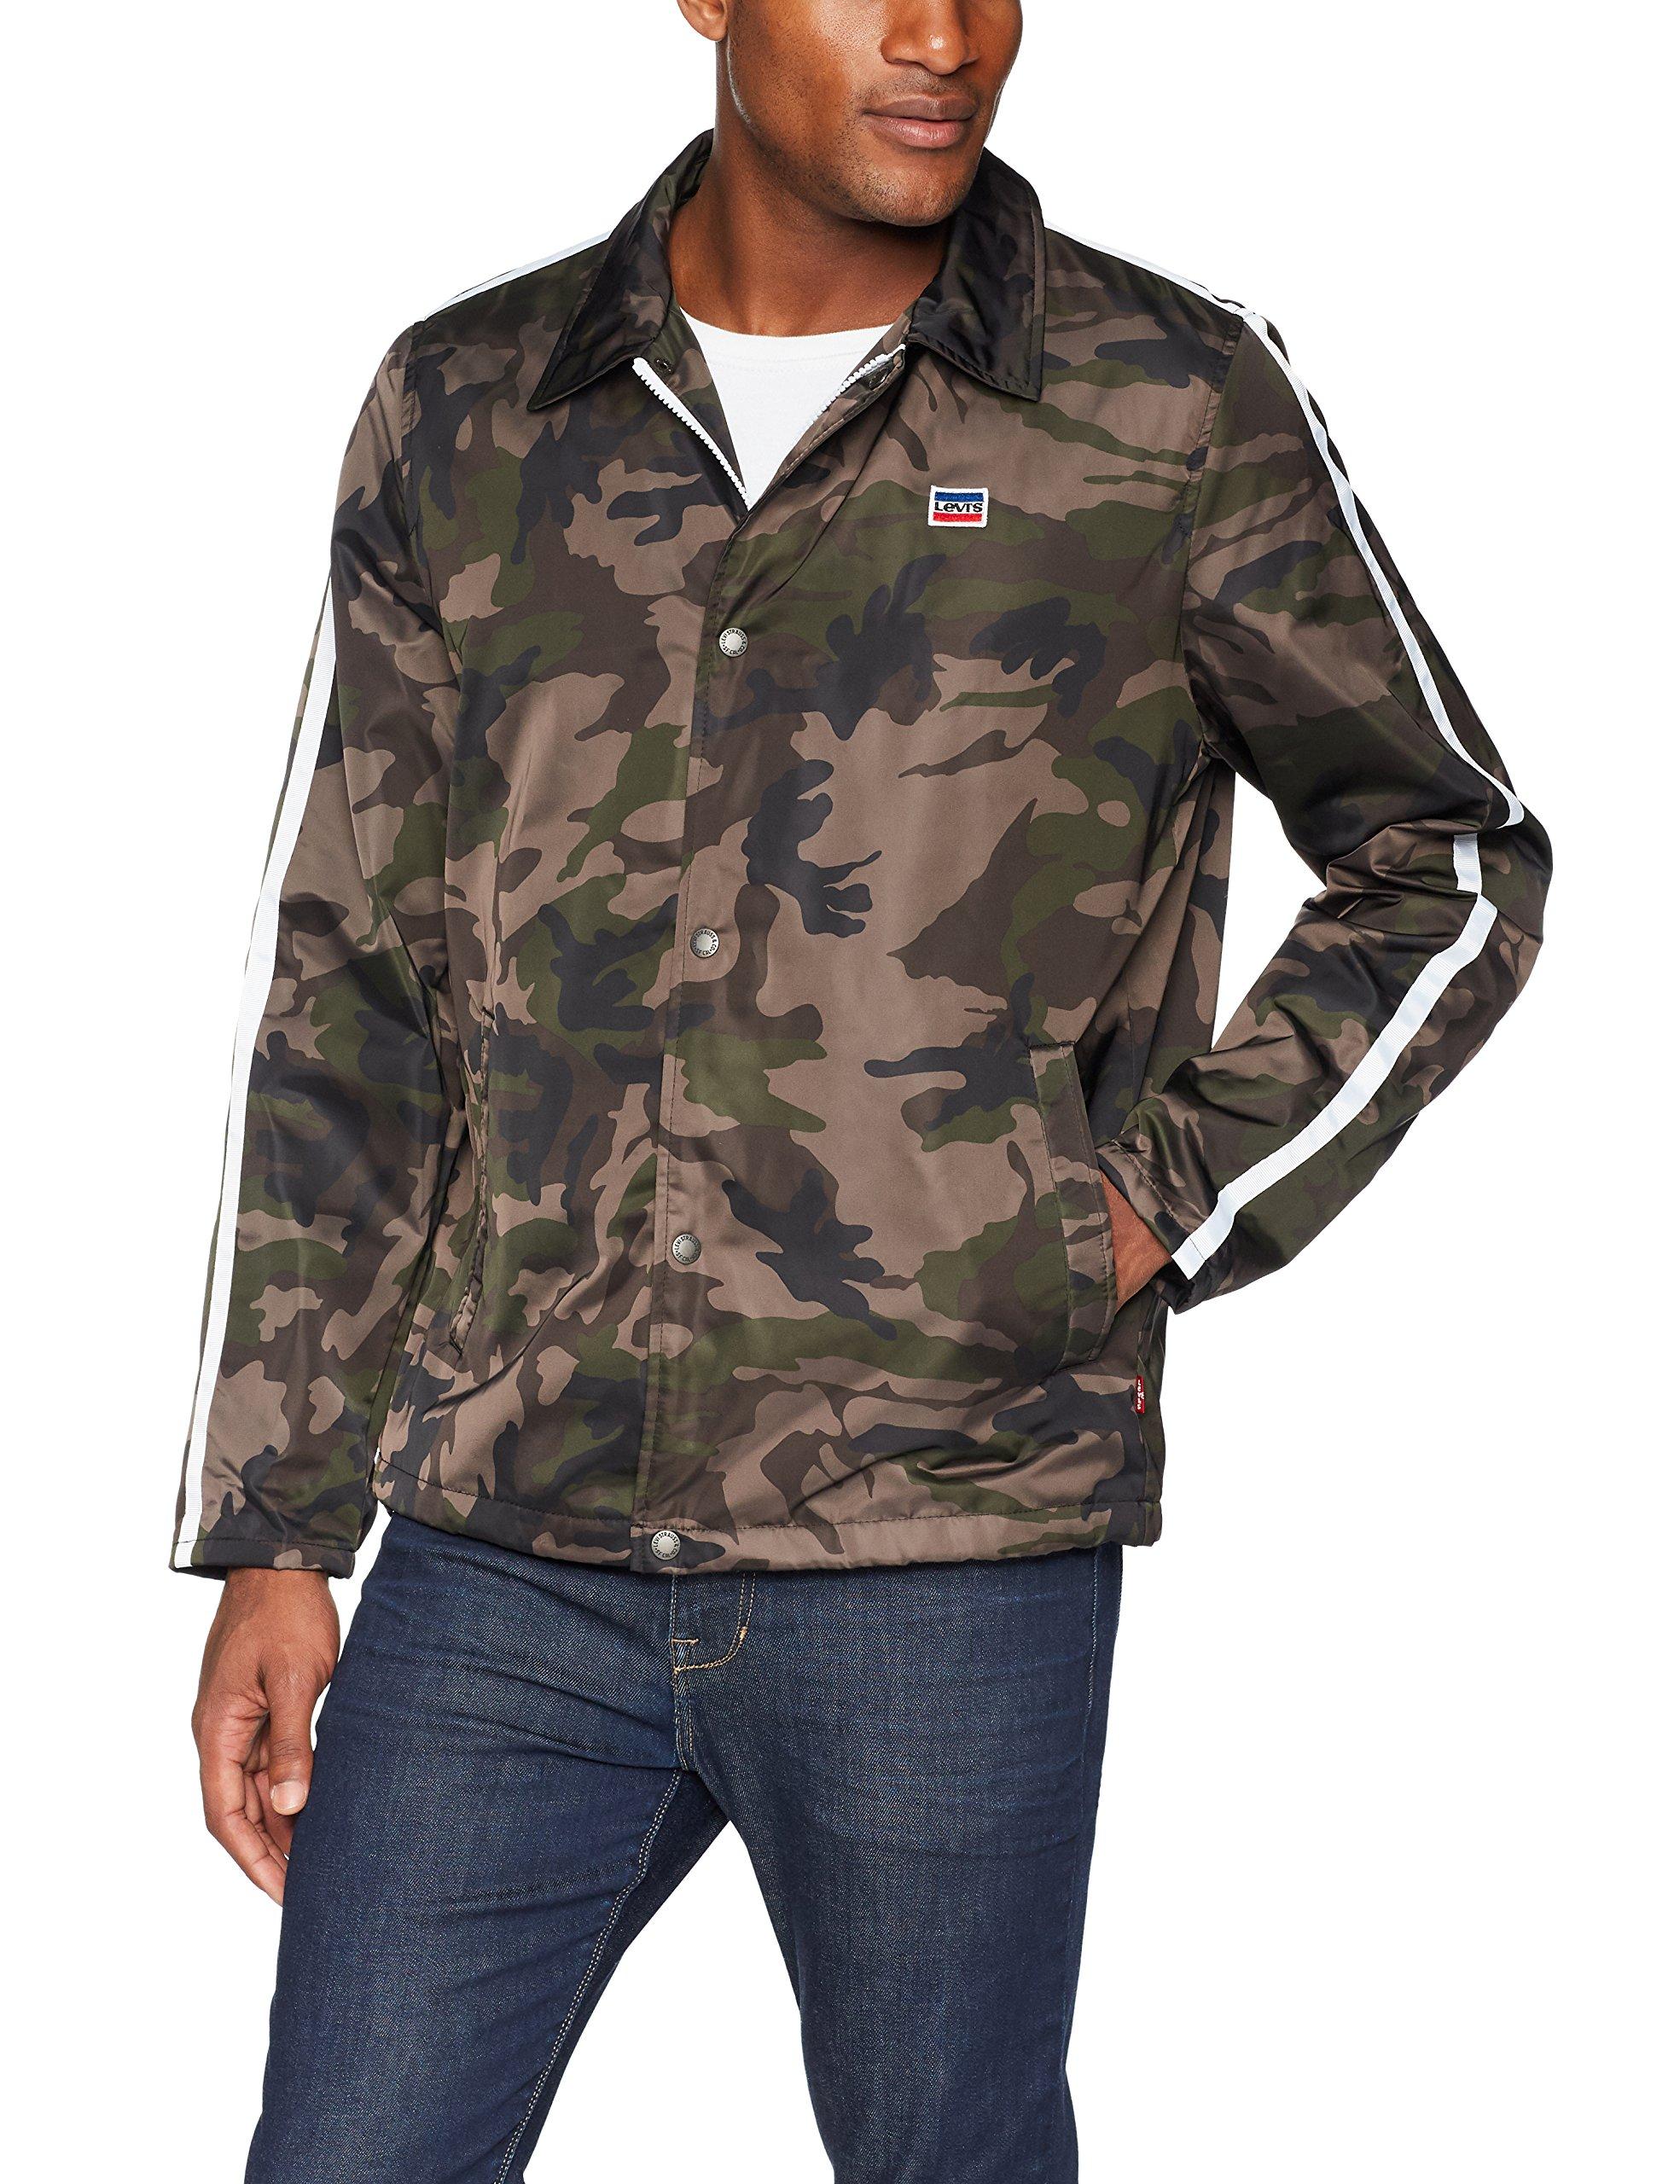 Levi's Men's Retro Coaches Jacket, Camouflage, XX-Large by Levi's